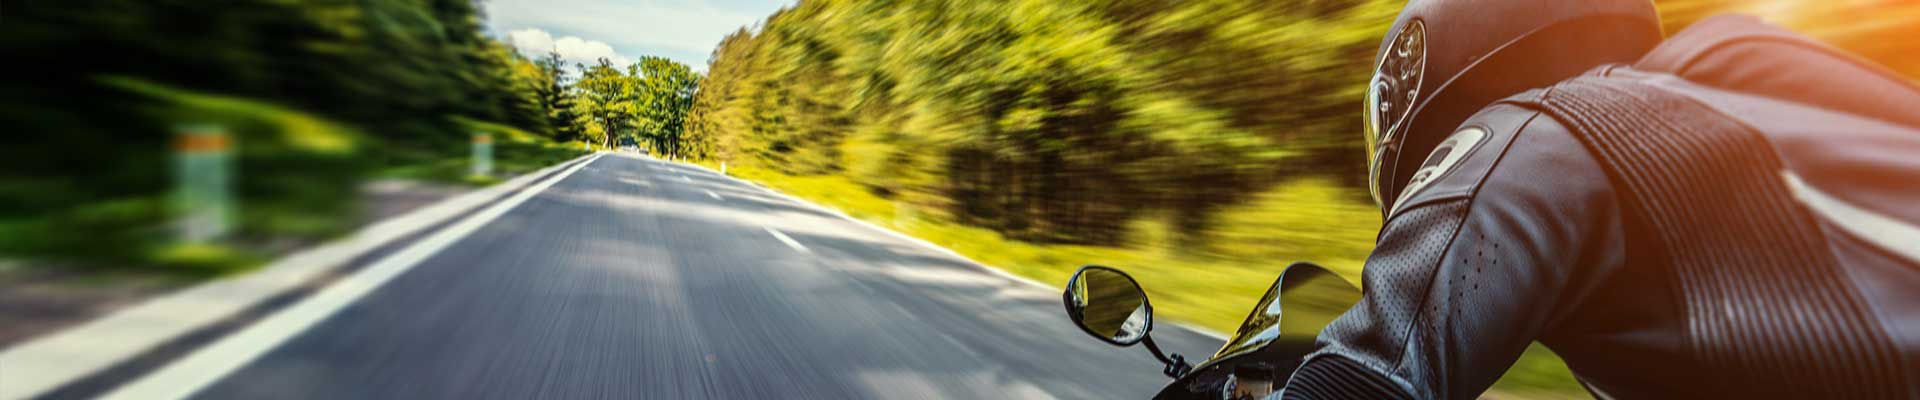 motorcycle-manufacturers-hub-banner